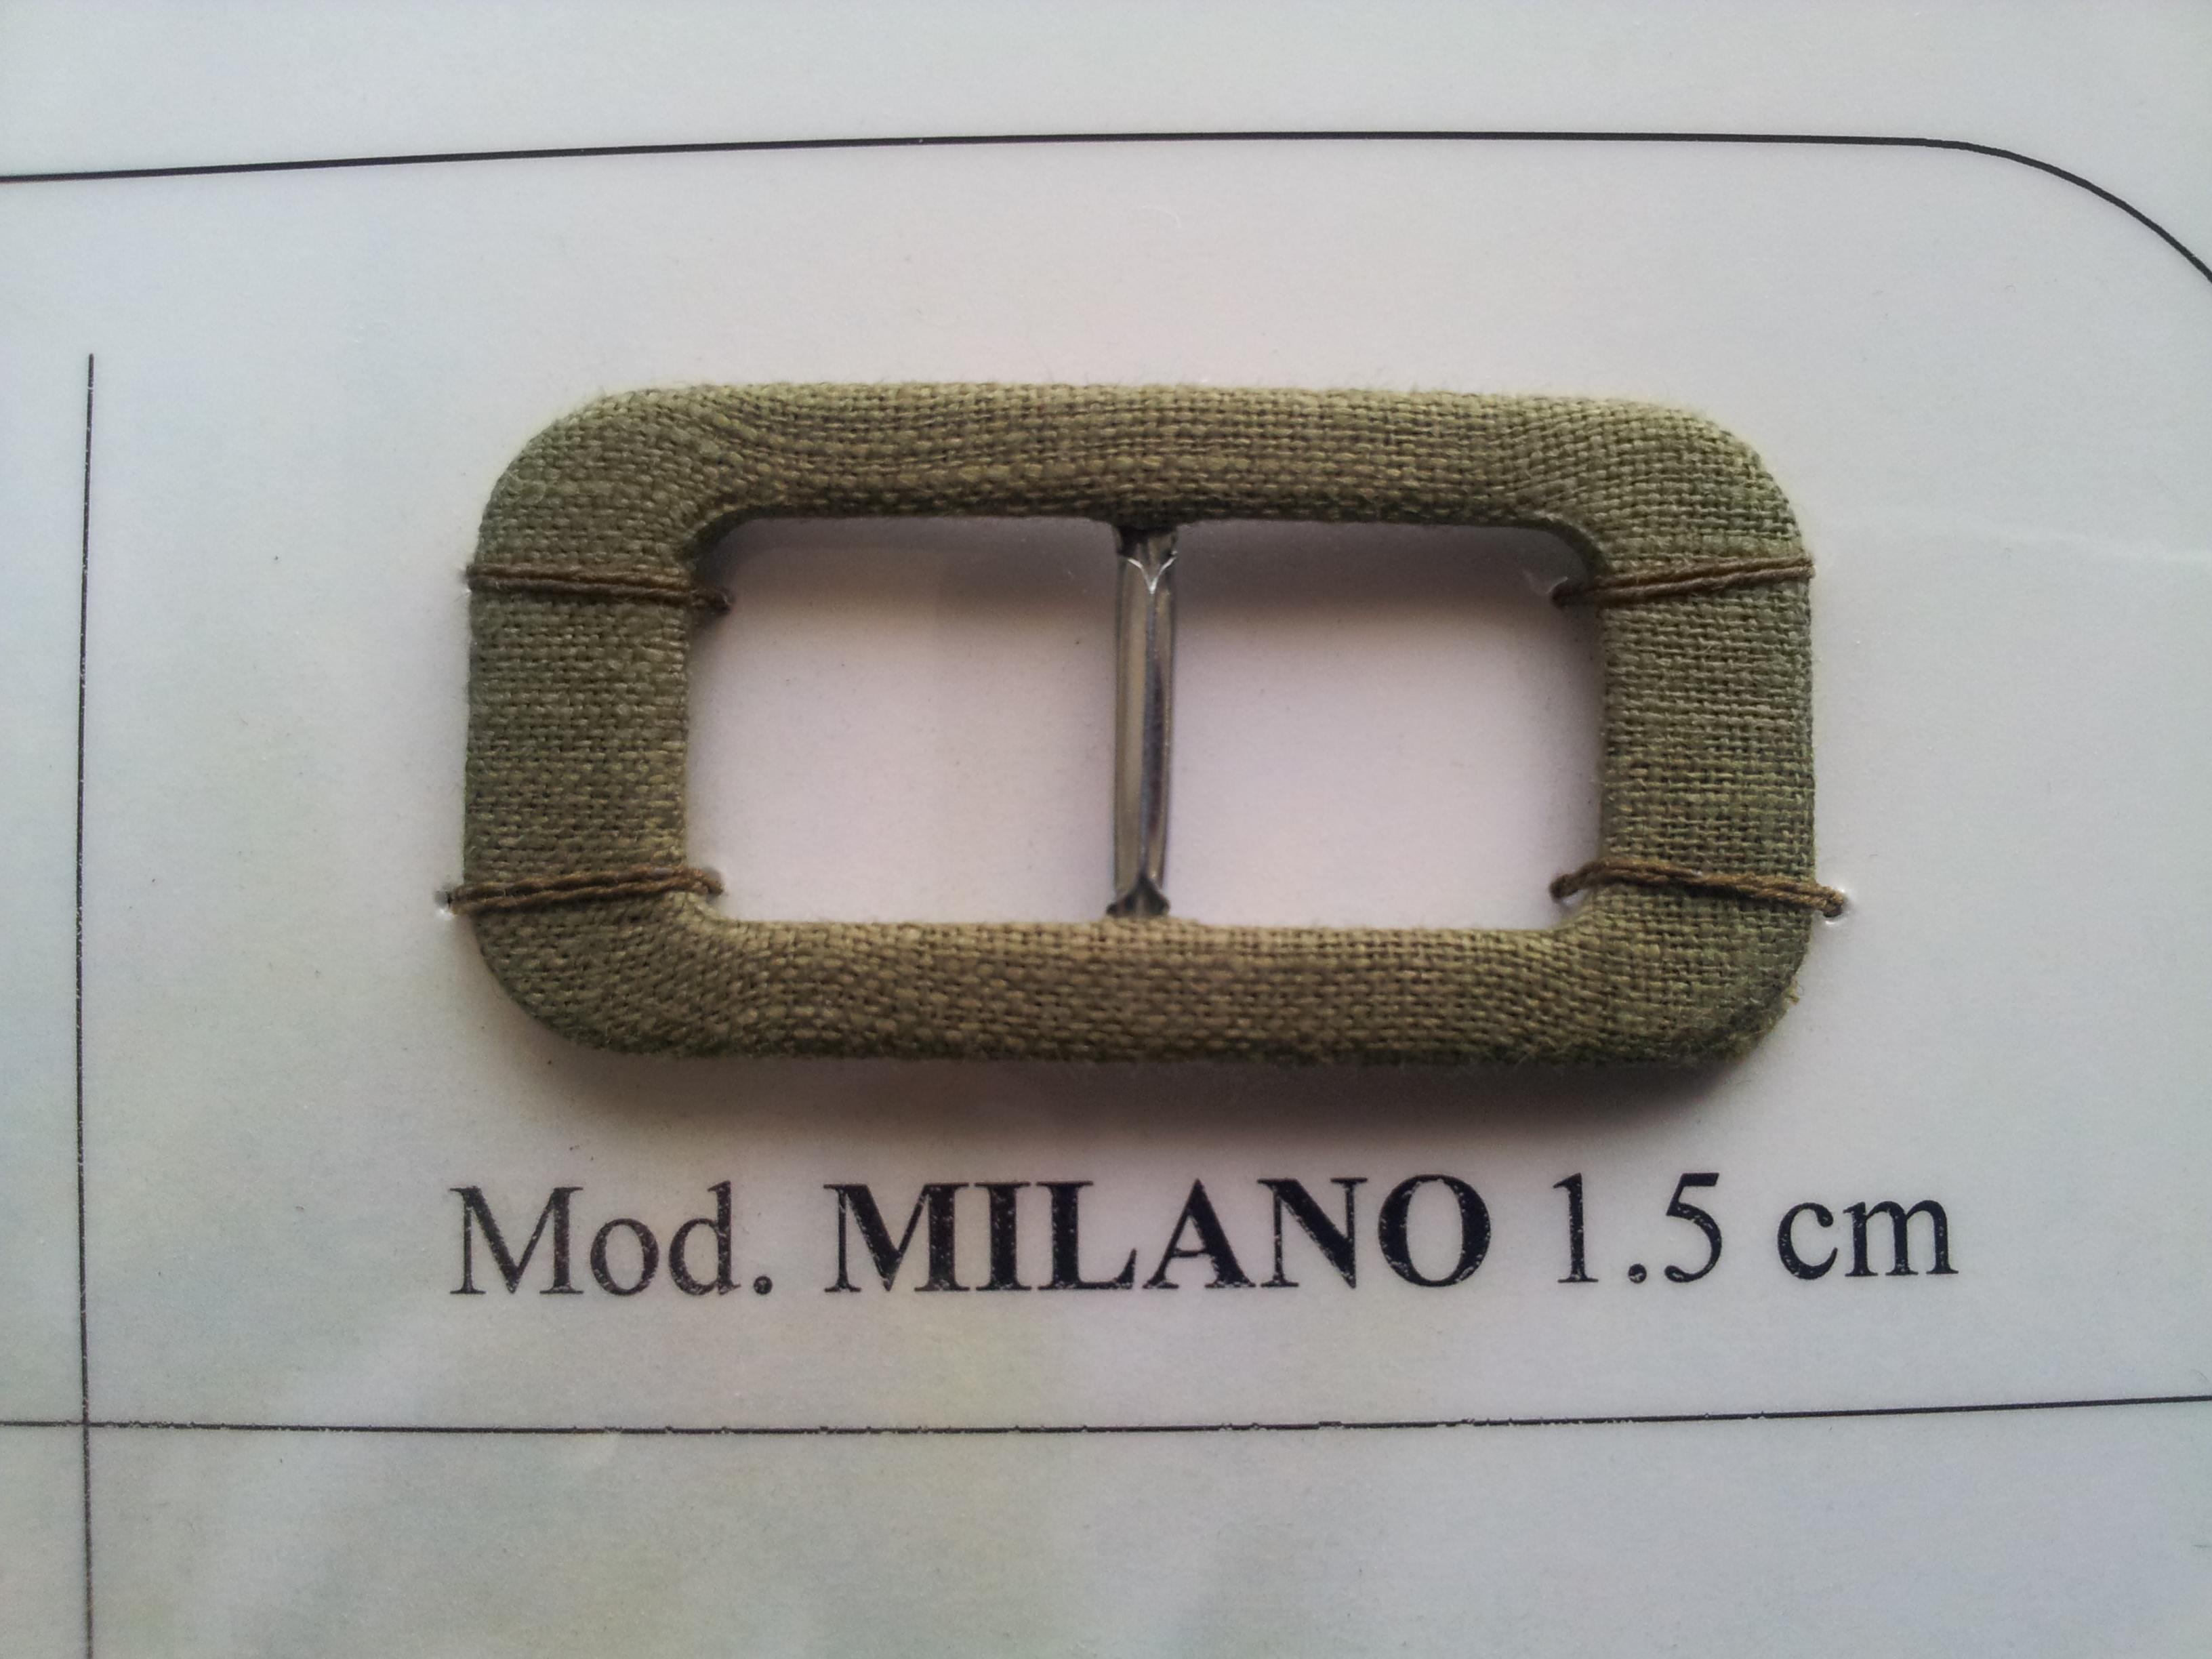 Art.MILANO.jpg